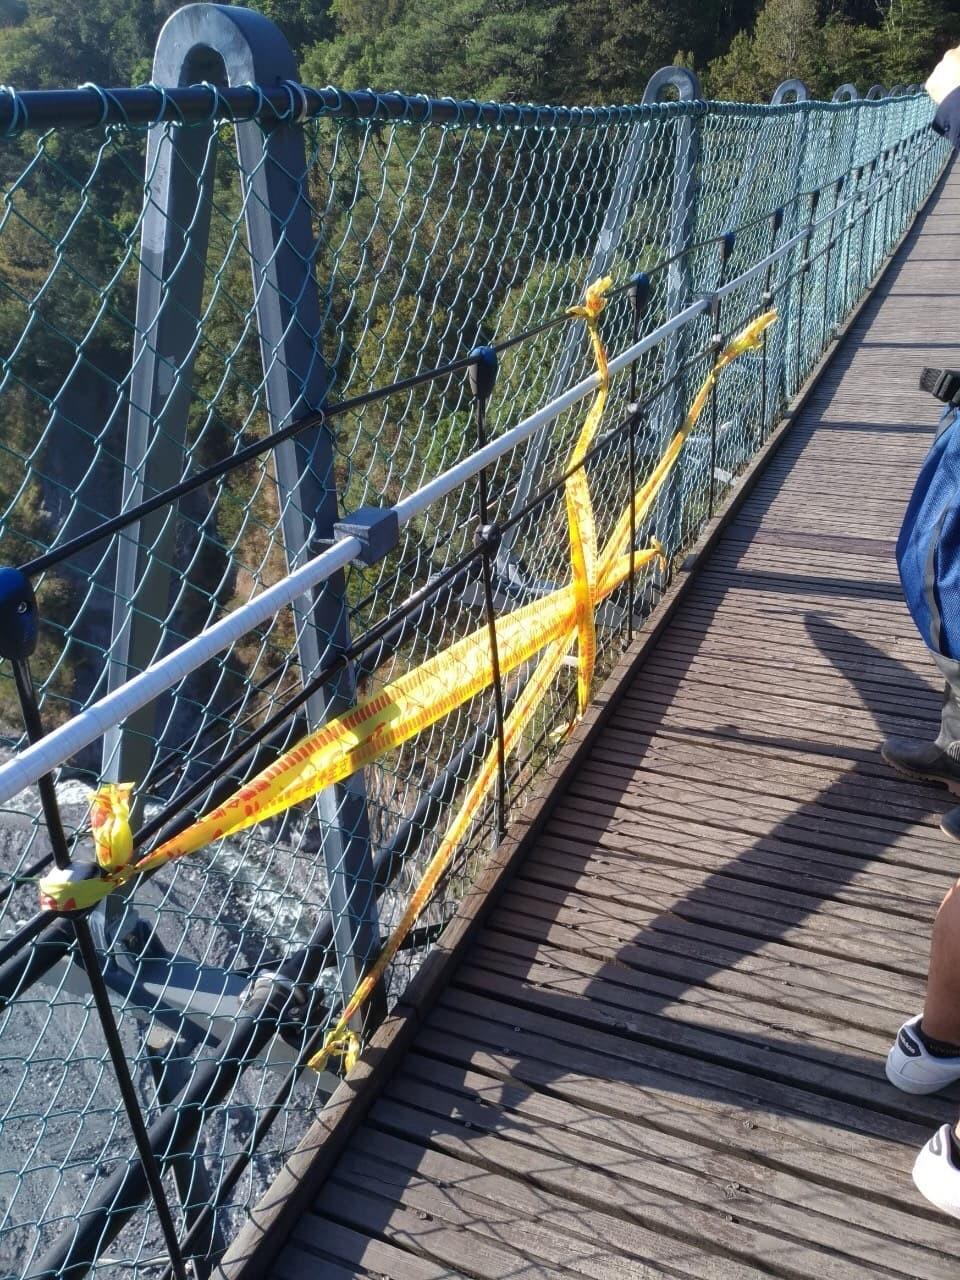 2-year-old falls to his death through gap in central Taiwan bridge